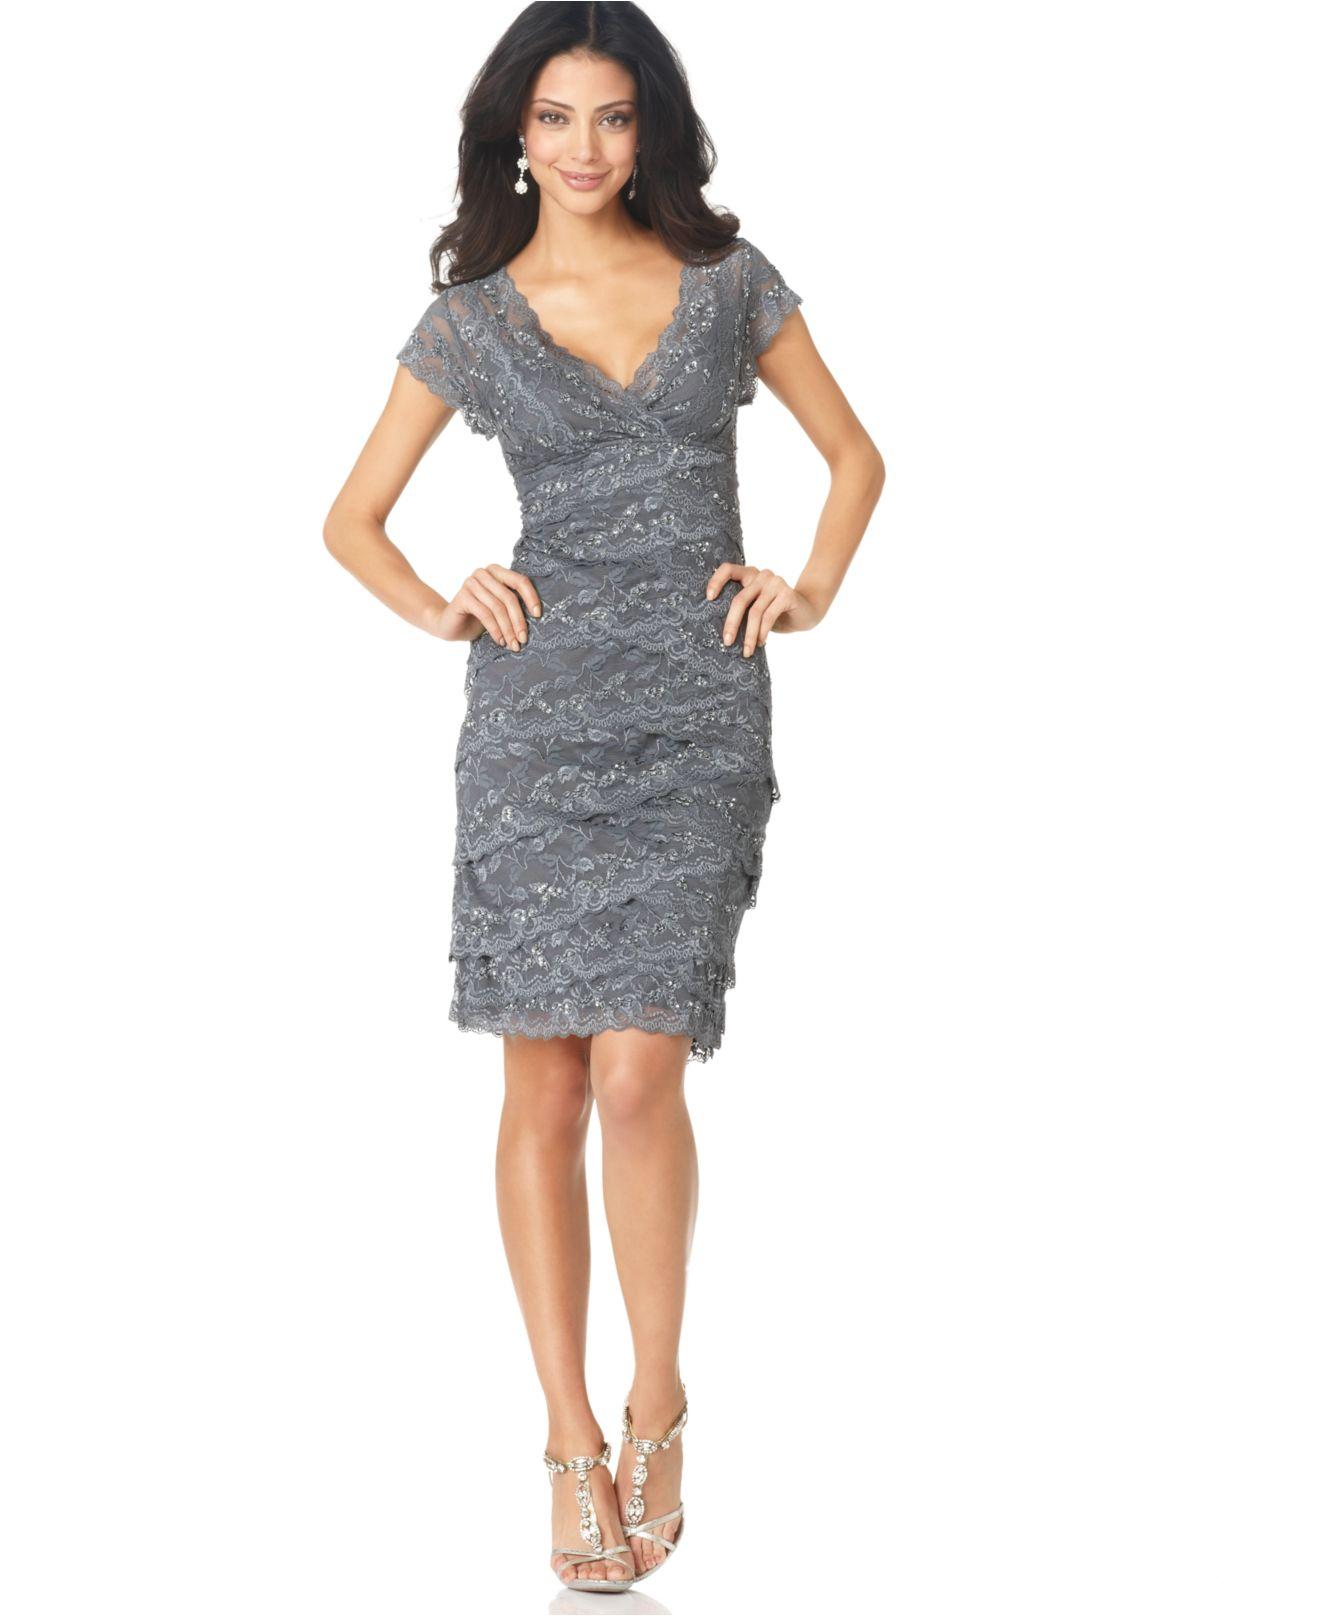 Marina Petite Cap-Sleeve Lace Dress in Gray | Lyst